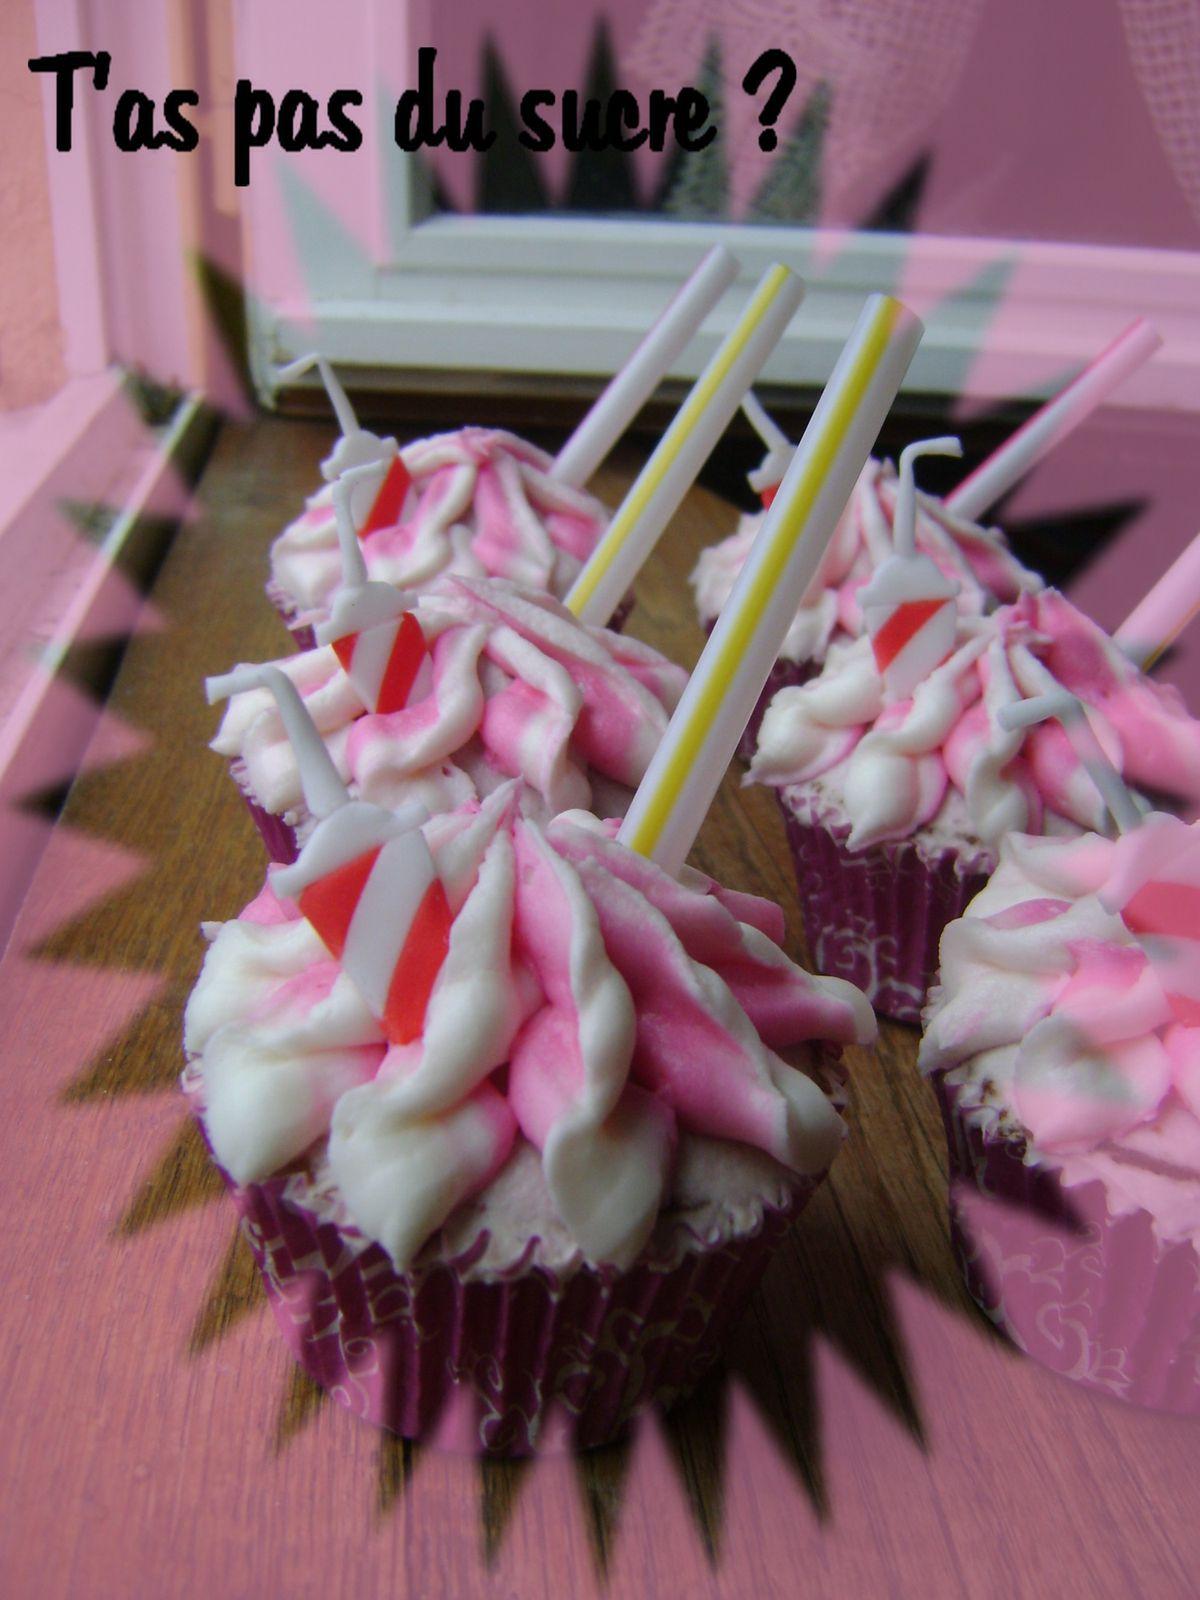 Cupcakes &quot&#x3B;Cherry coke&quot&#x3B; !